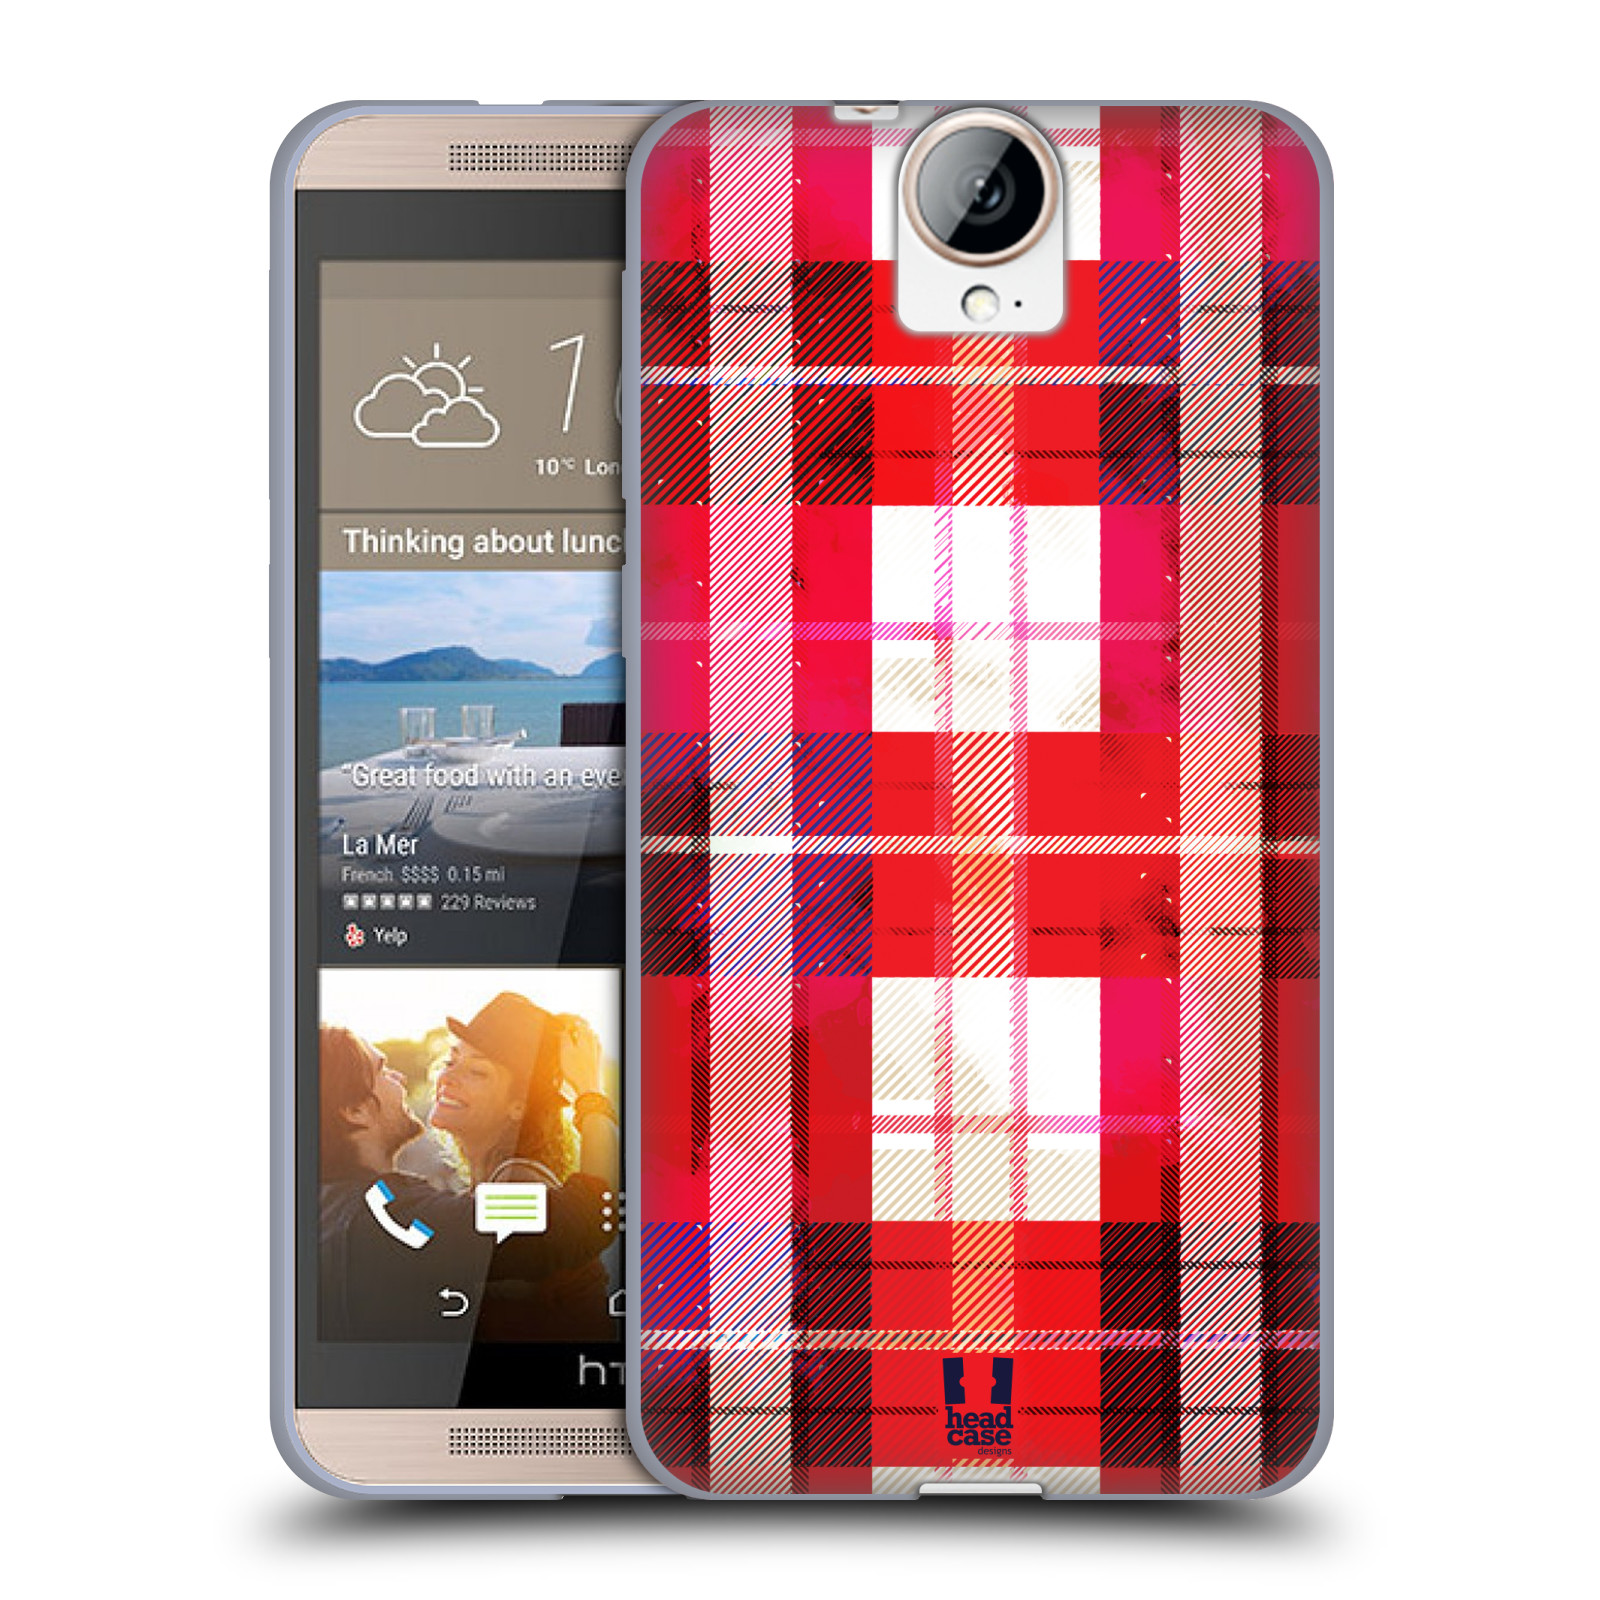 Silikonové pouzdro na mobil HTC One E9+(Plus) HEAD CASE FLANEL RED (Silikonový kryt či obal na mobilní telefon HTC One E9+)